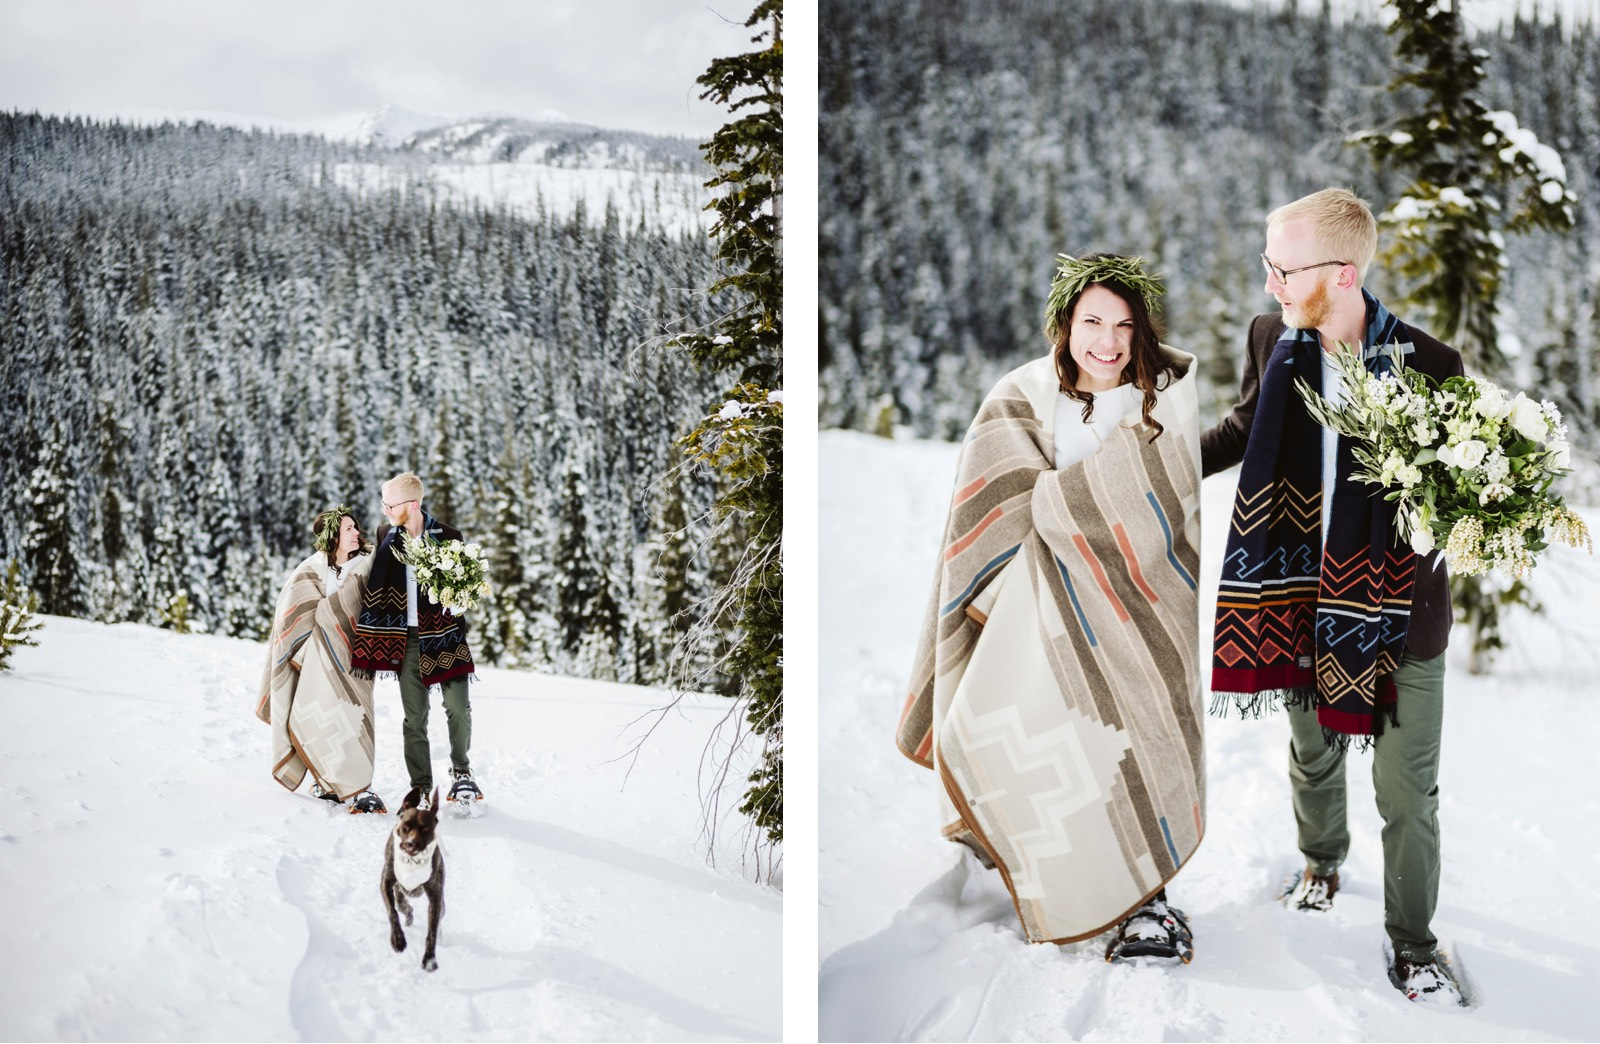 alpine-lakes-high-camp-winter-wedding-56 ALPINE LAKES HIGH CAMP WEDDING